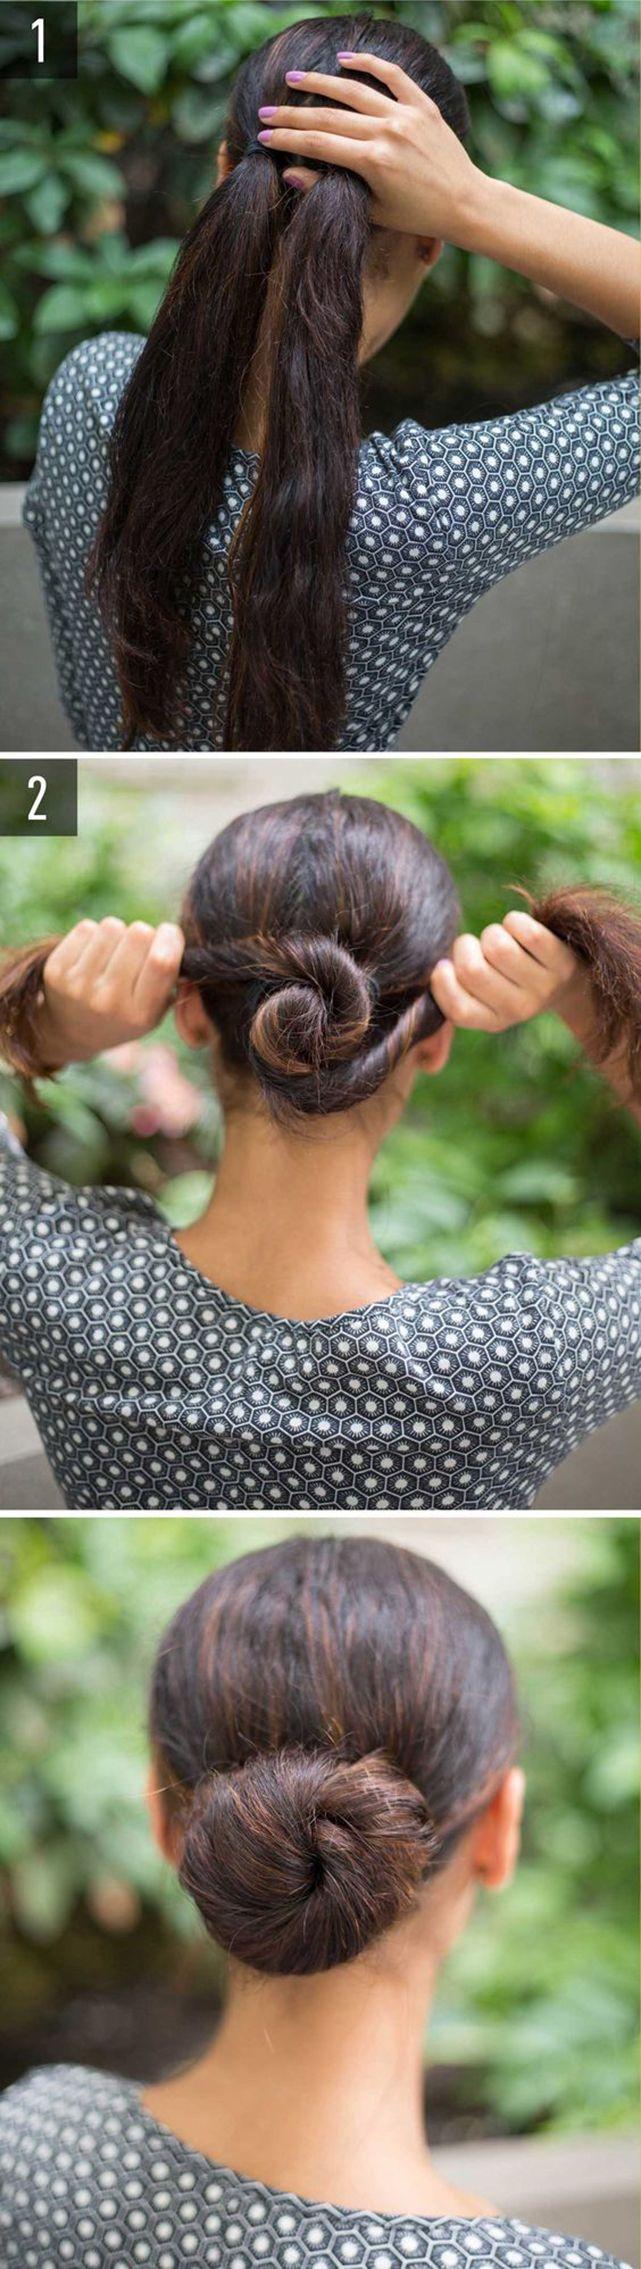 Cinco penteados para driblar qualquer bad hair day » Harper's Bazaar